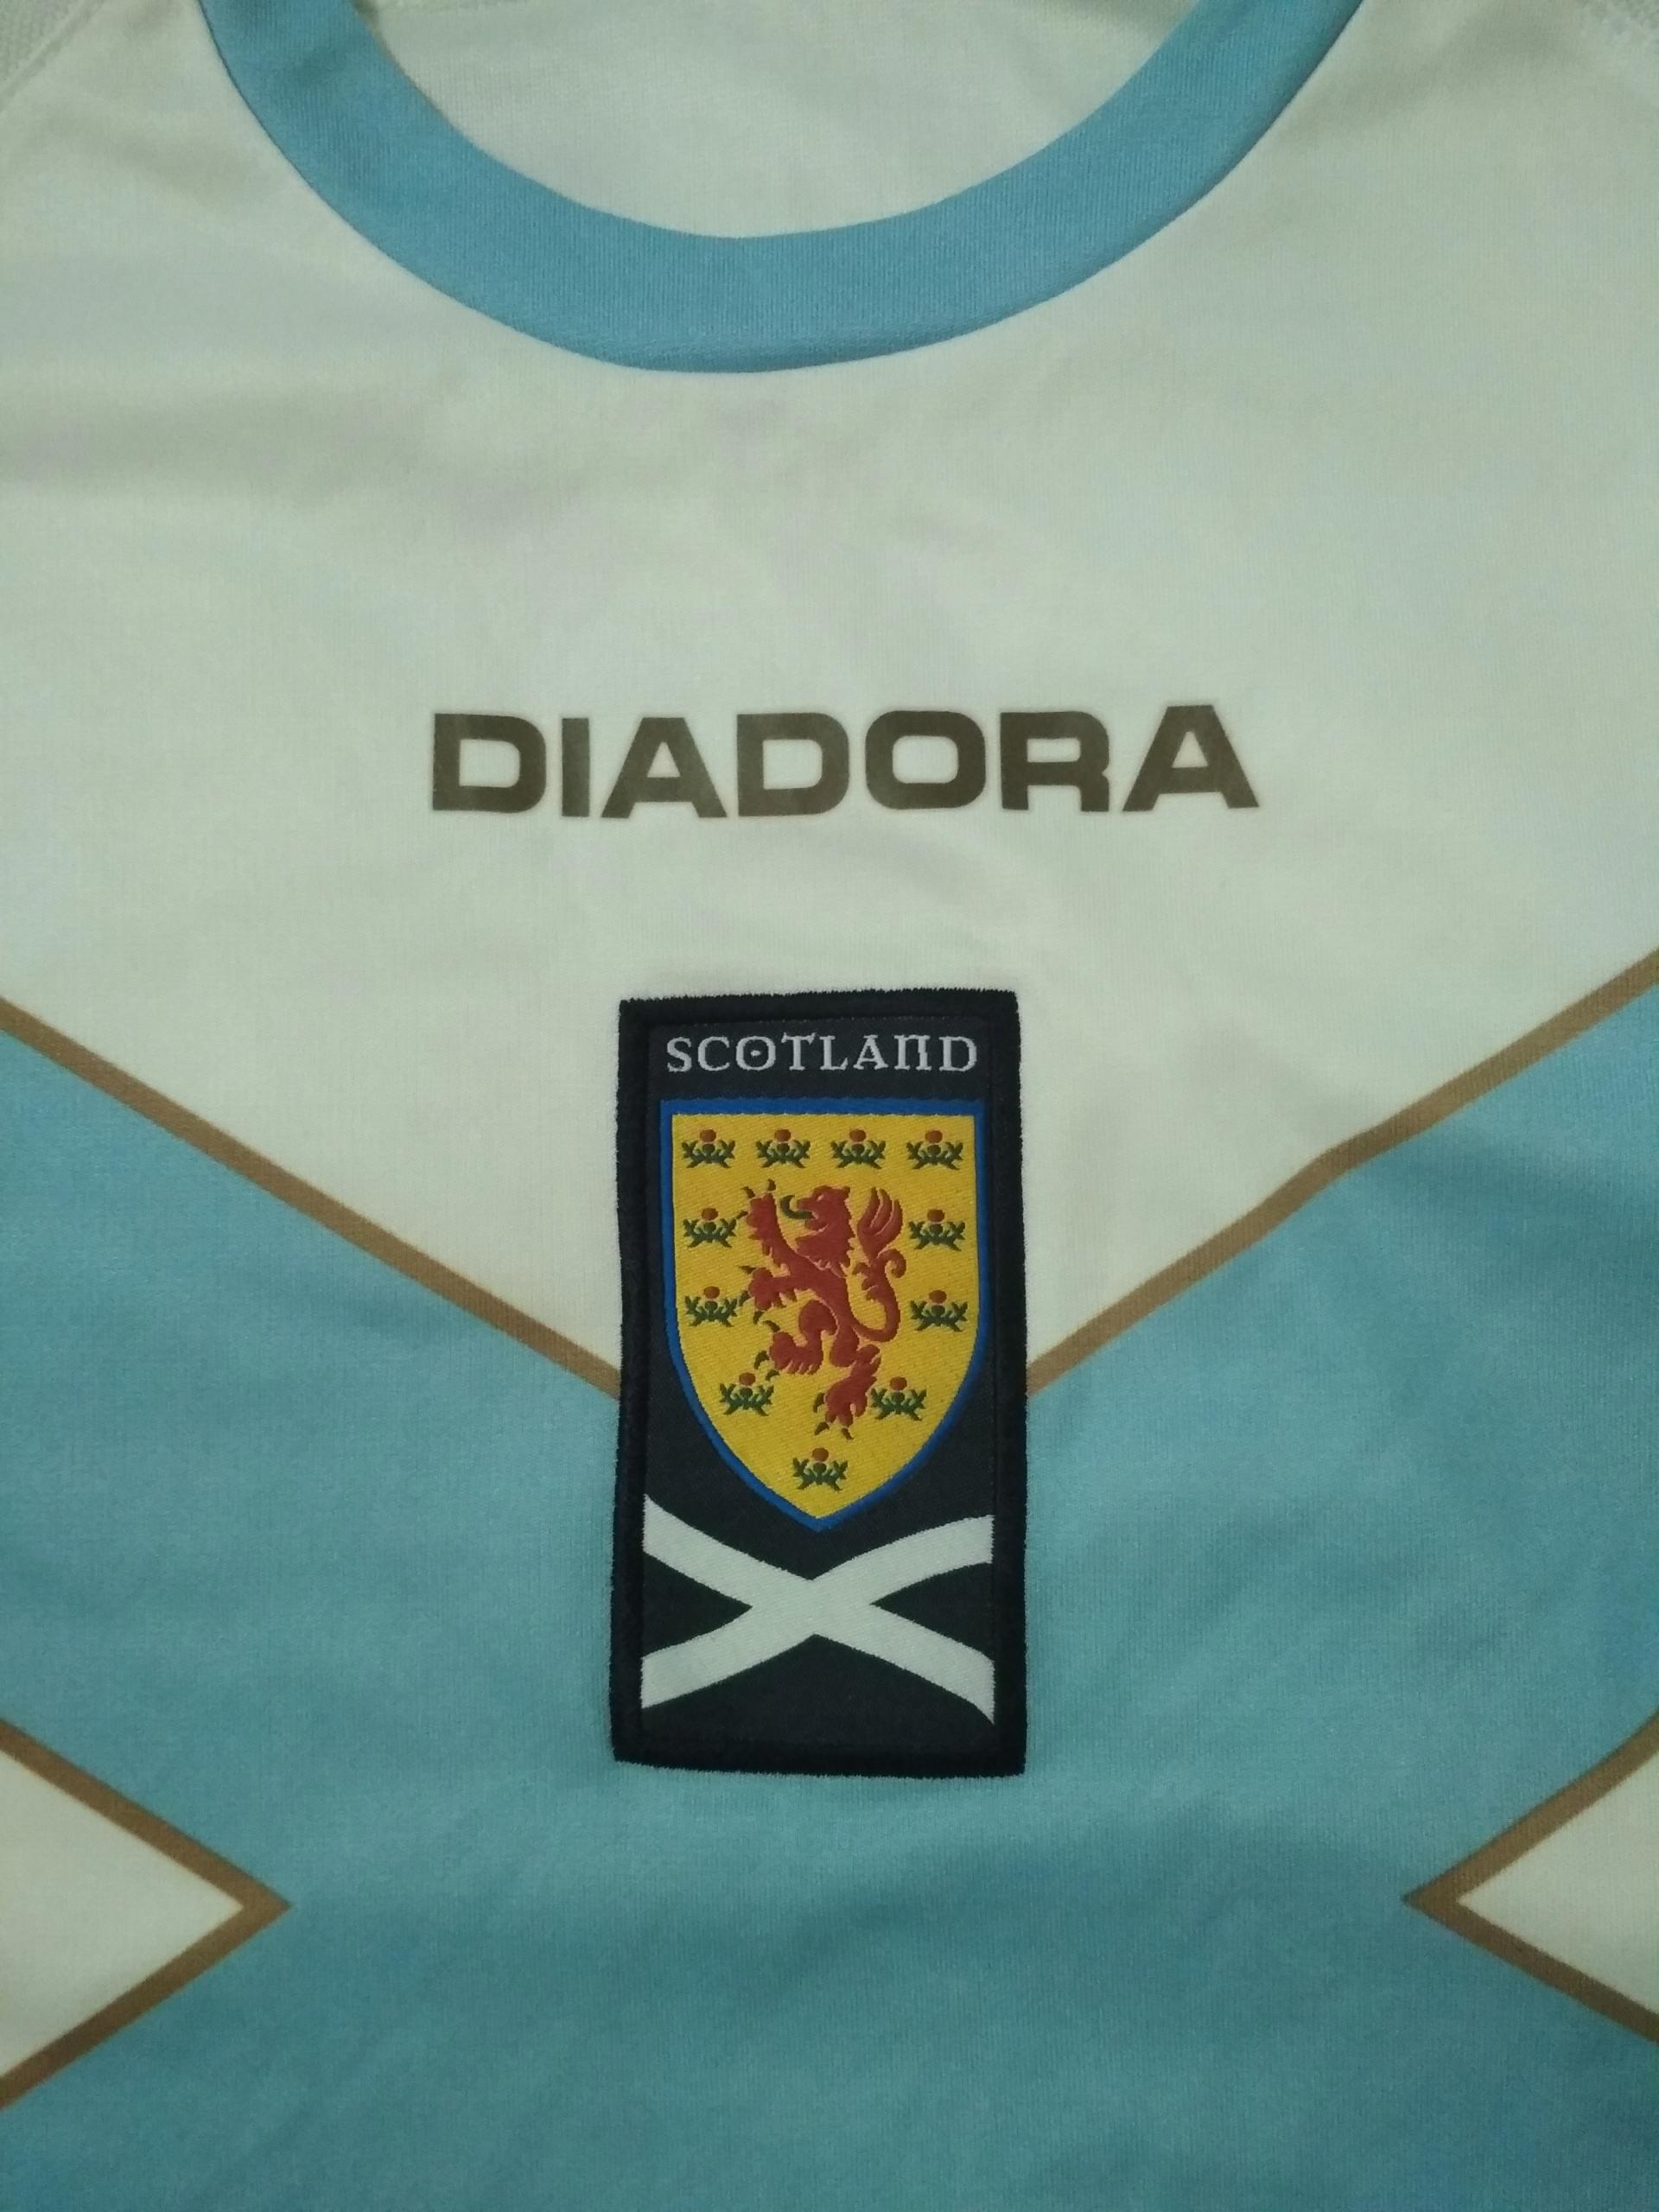 OKAZJA!!! Koszuka Diadora Scotland, rozmiar L